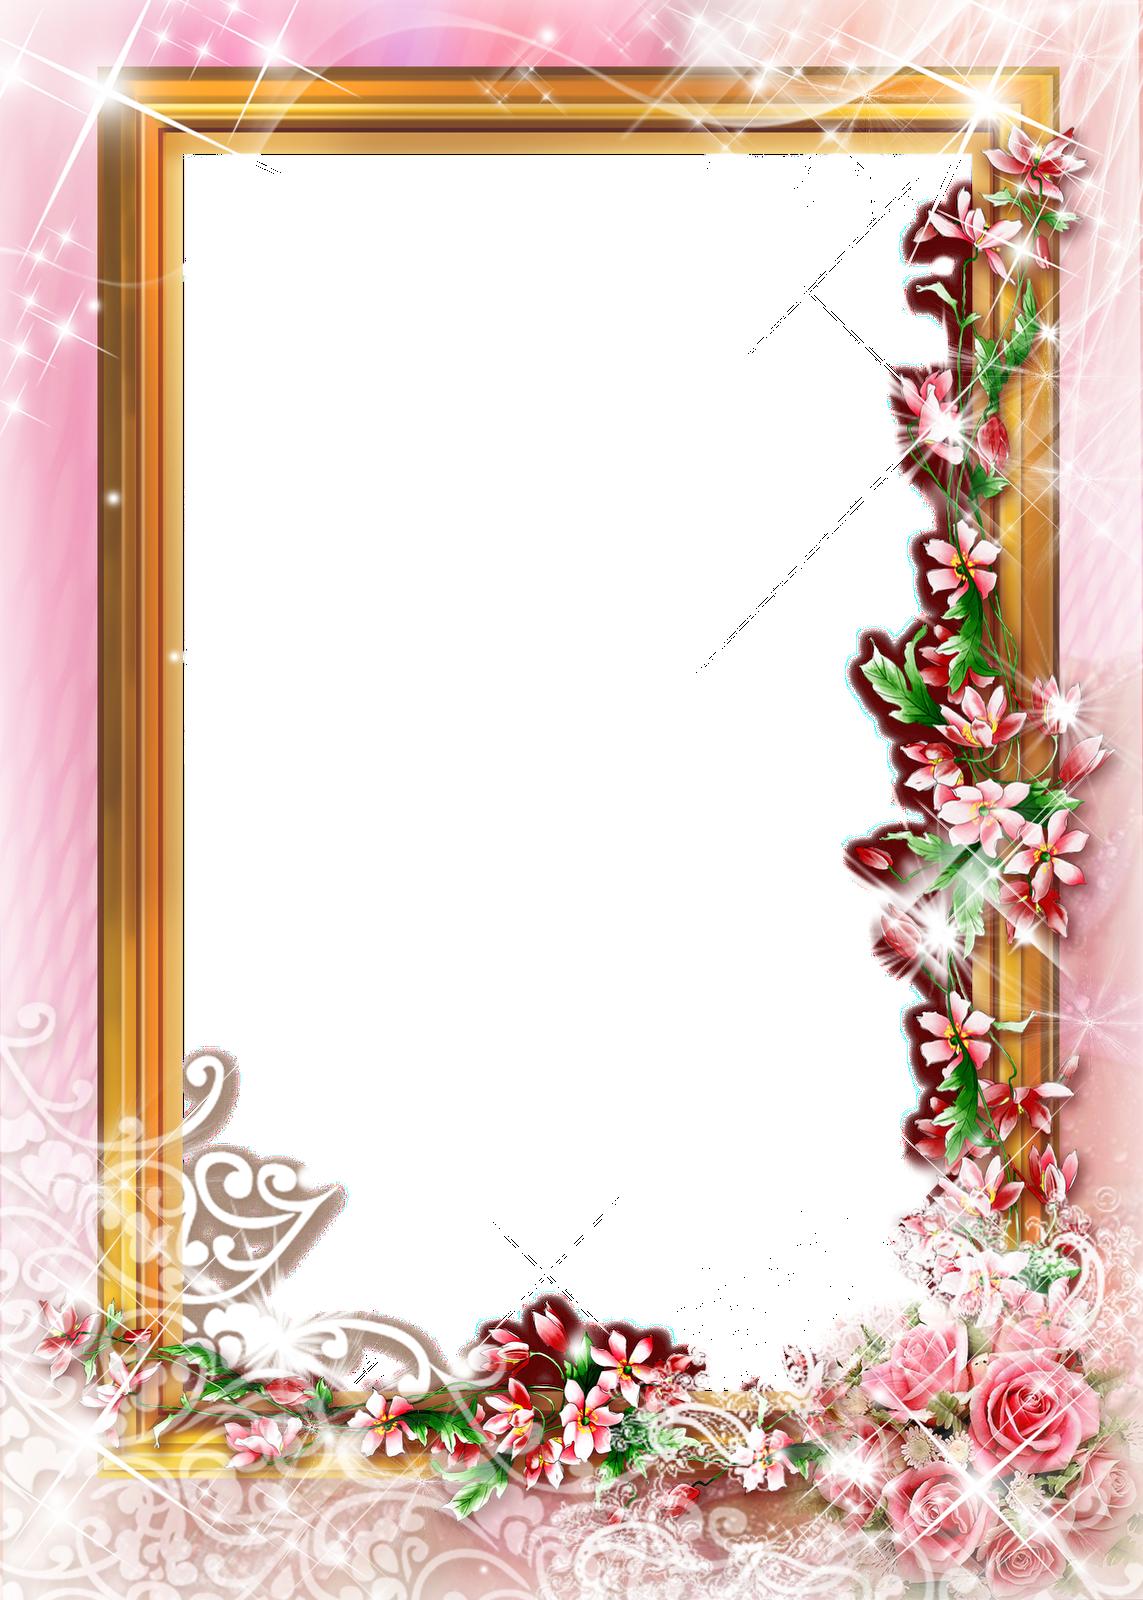 marcos para photoshop  marcos florales